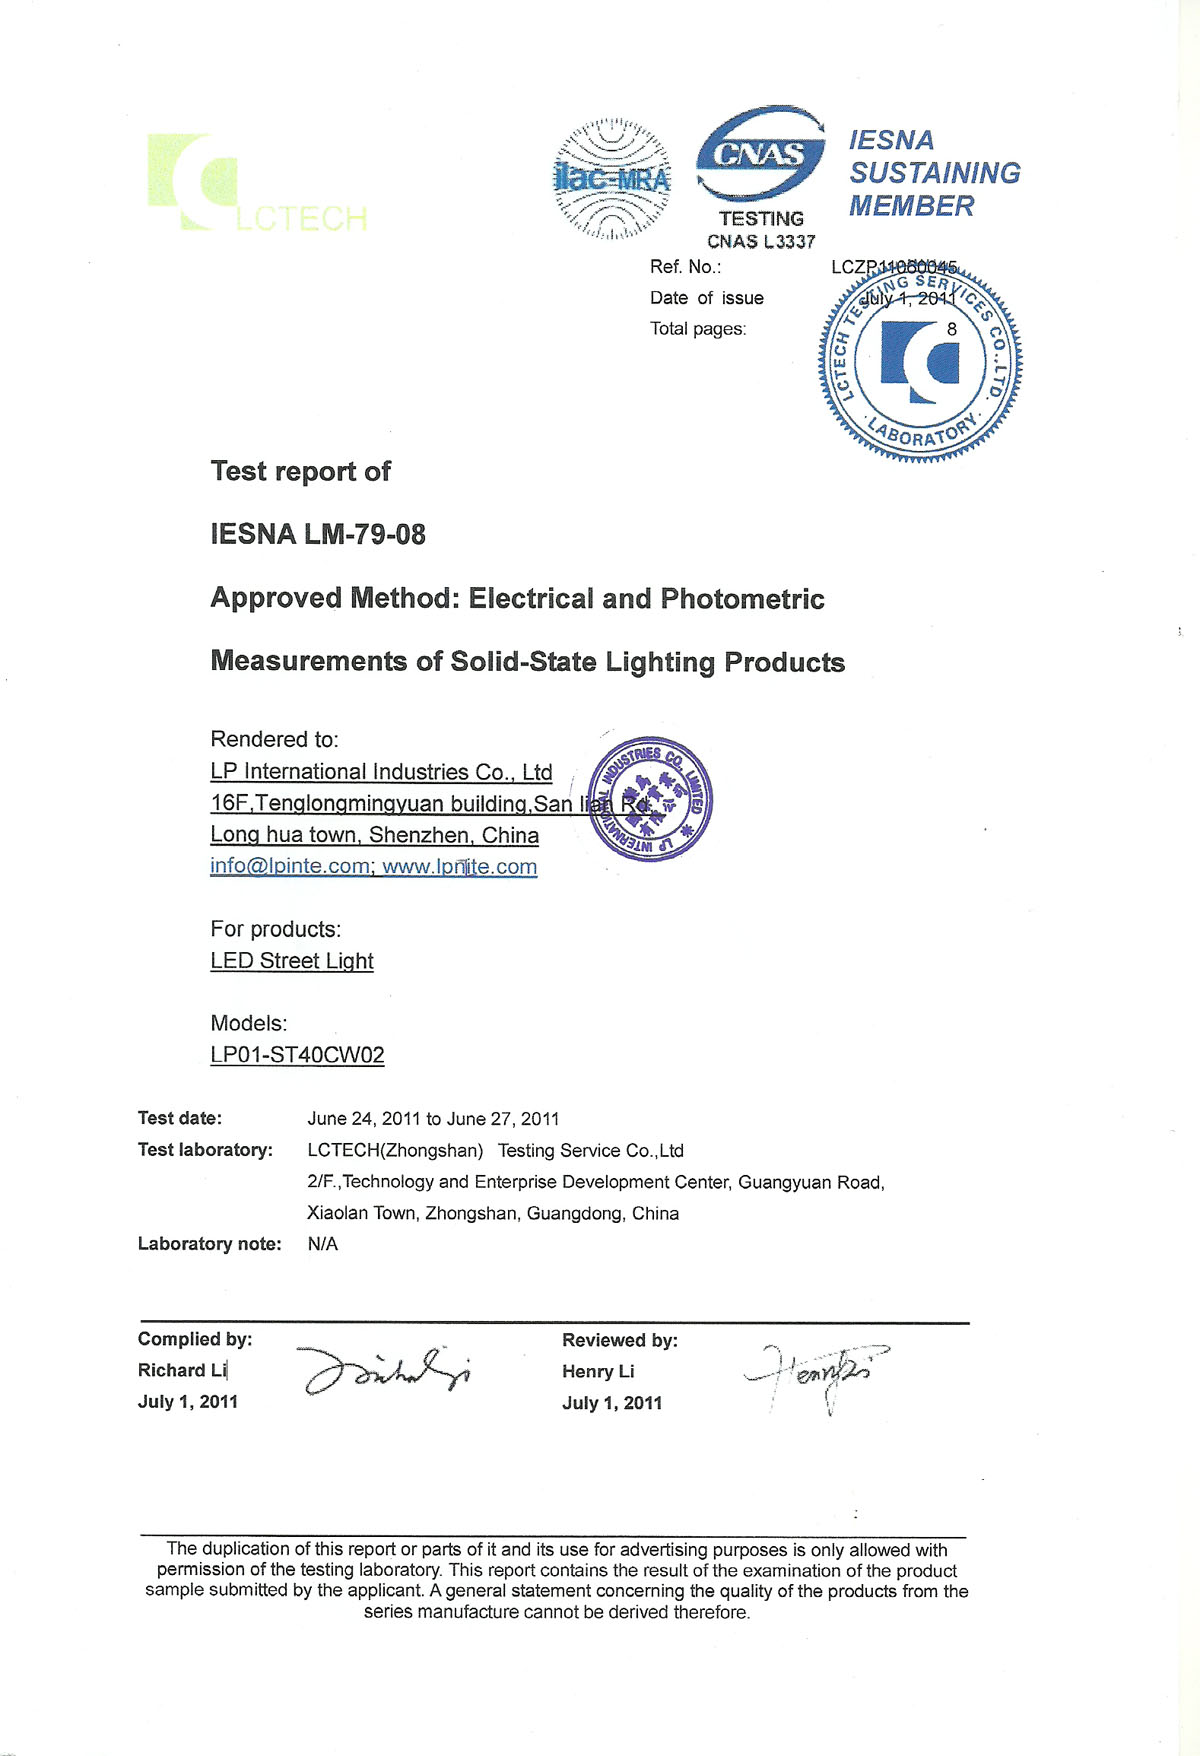 IESNA LM-79-08 40W streetlight